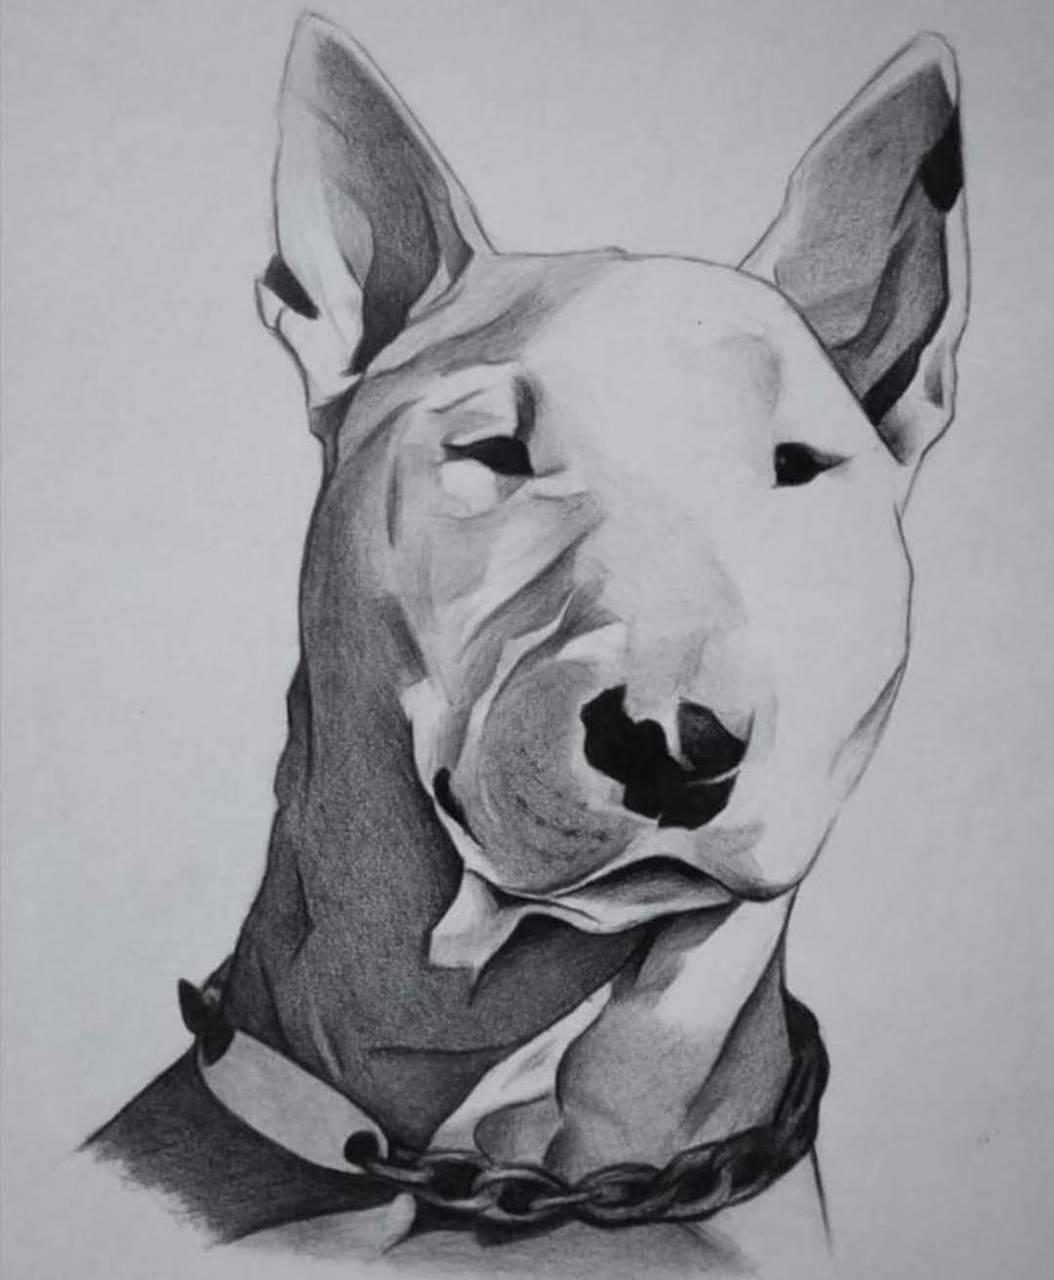 Bull terrier Coco